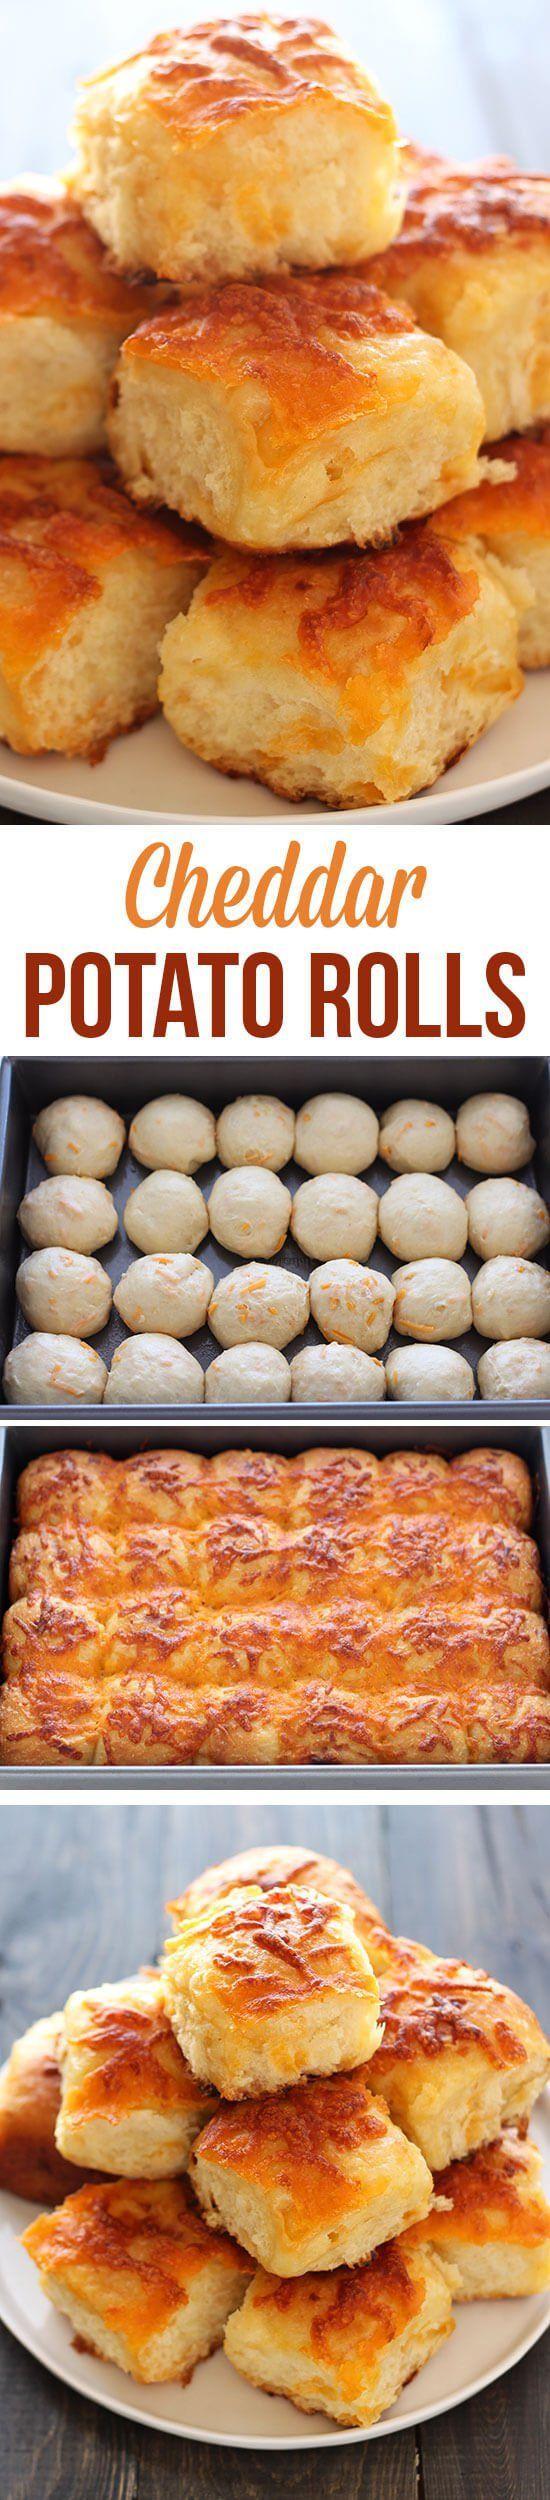 Cheddar Potato Rolls | CookJino